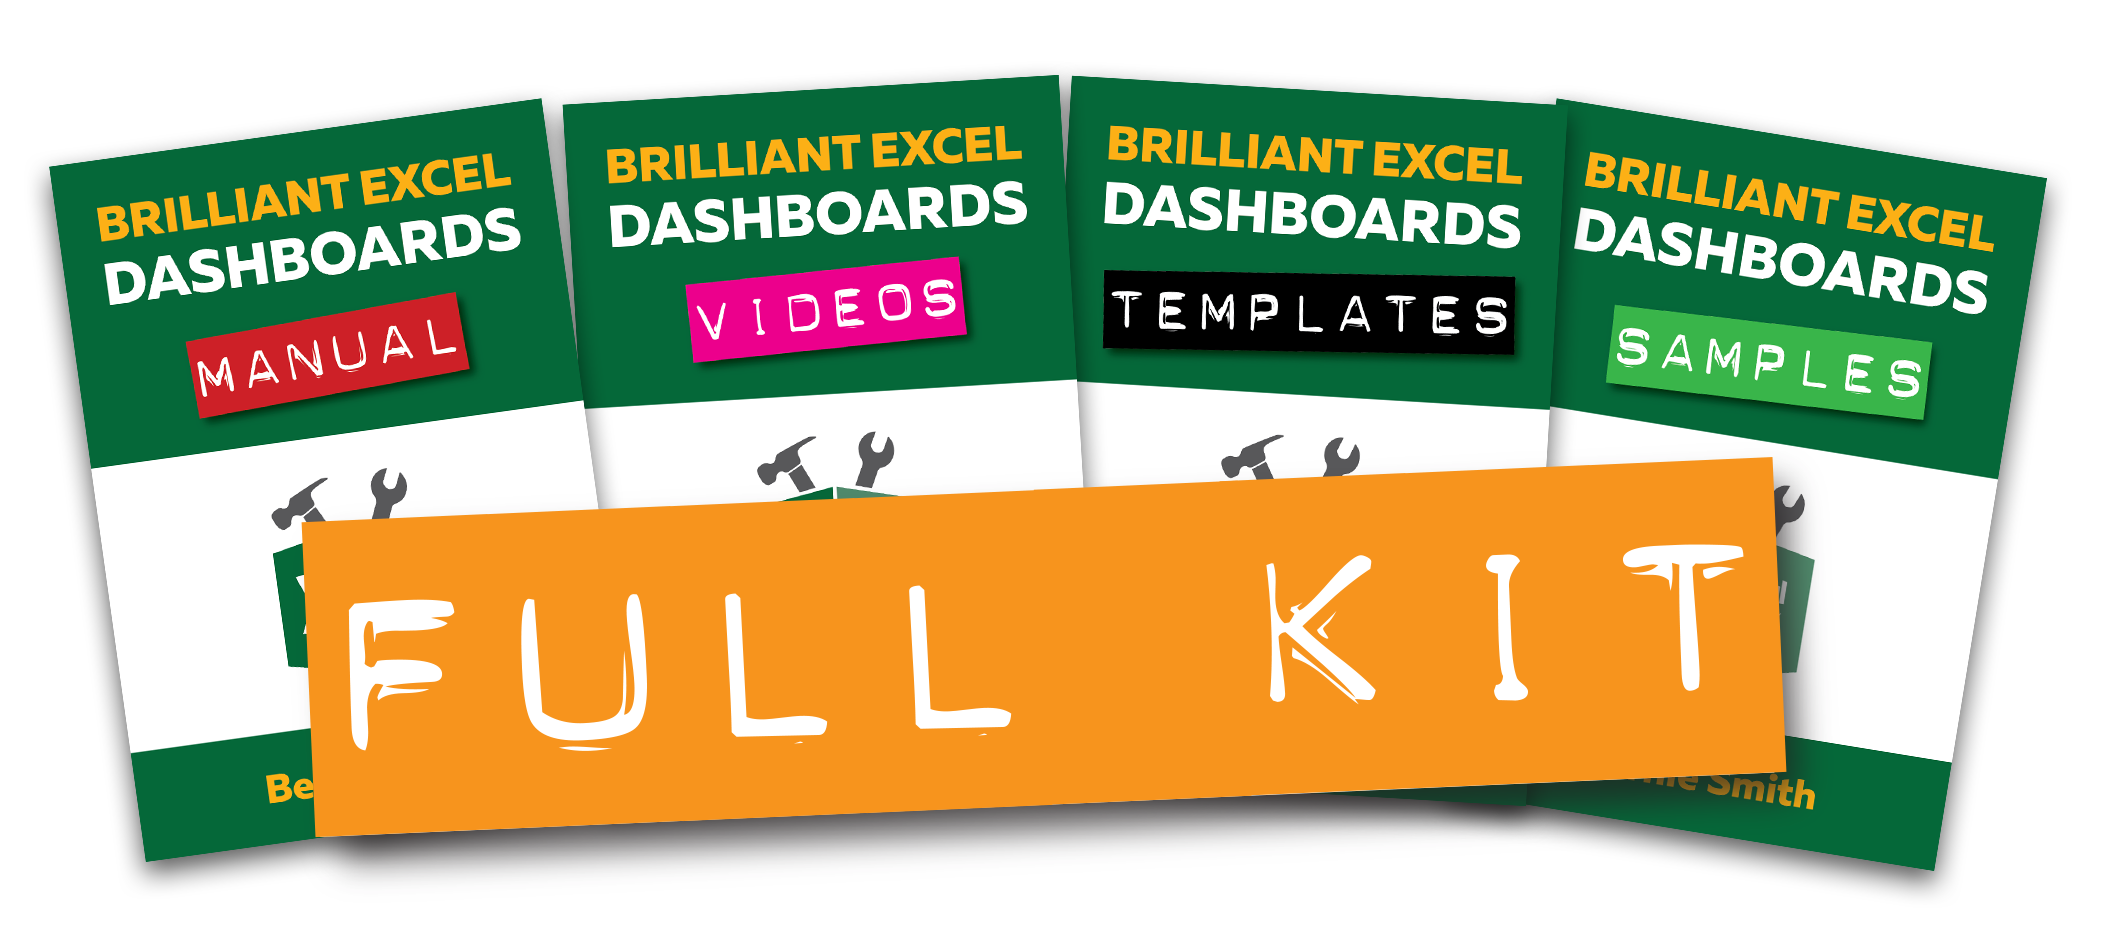 Brilliant Excel Dashboards Kit - Full Kit Image